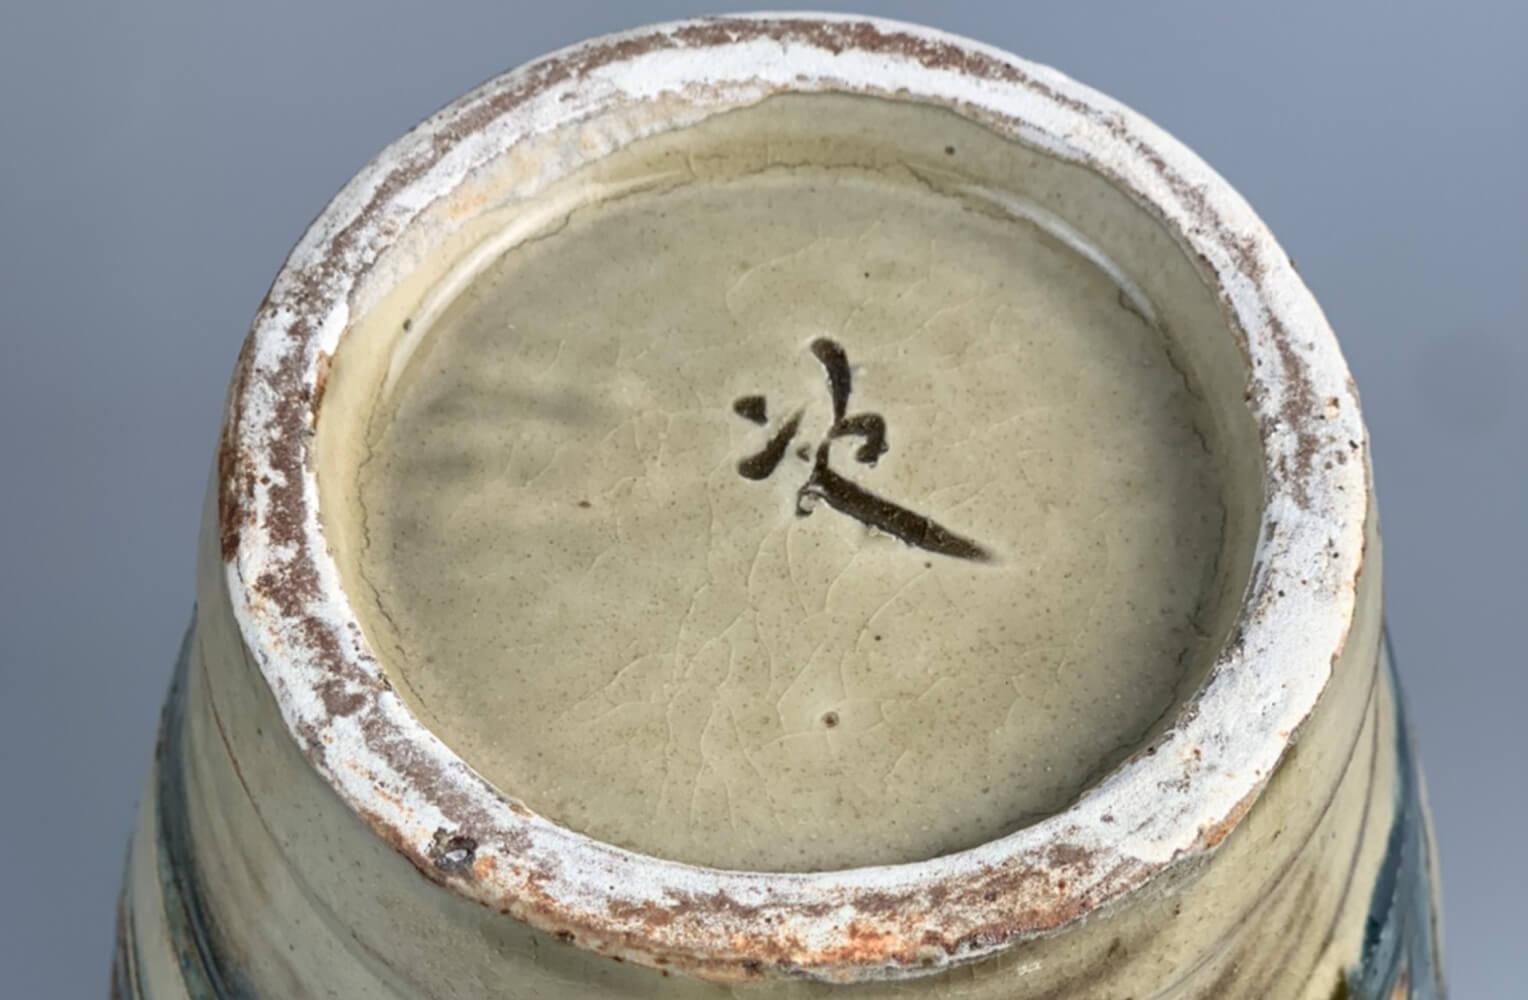 金城次郎「花瓶」商品アップ画像